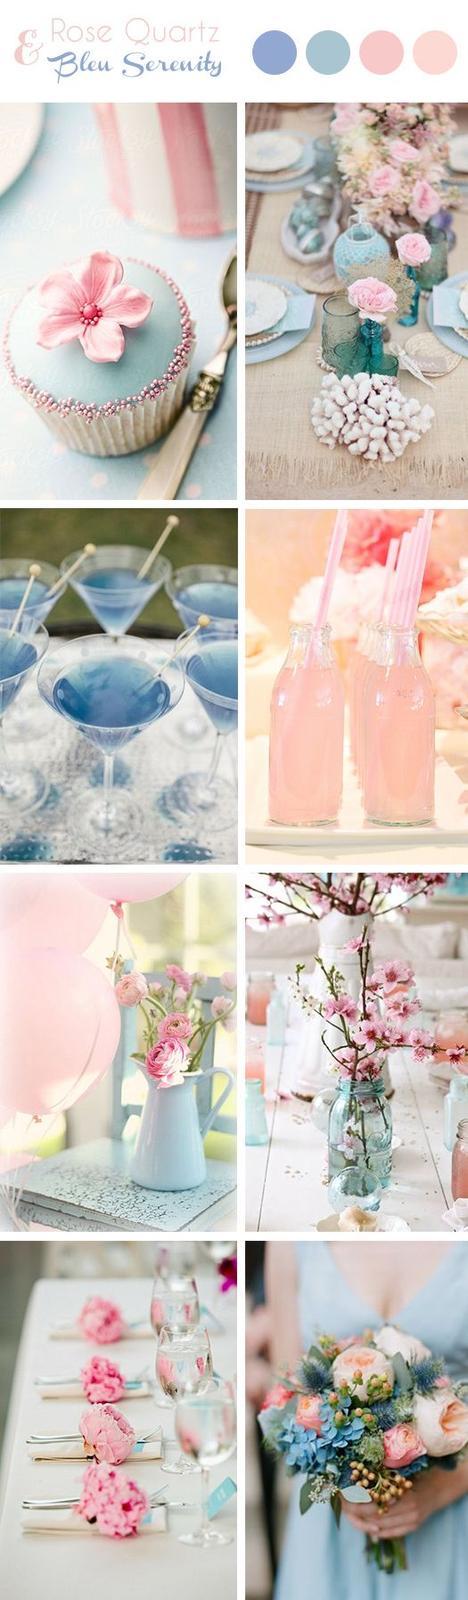 ♥ Rose Quartz - Serenity - Lilac ♥ - Obrázok č. 54